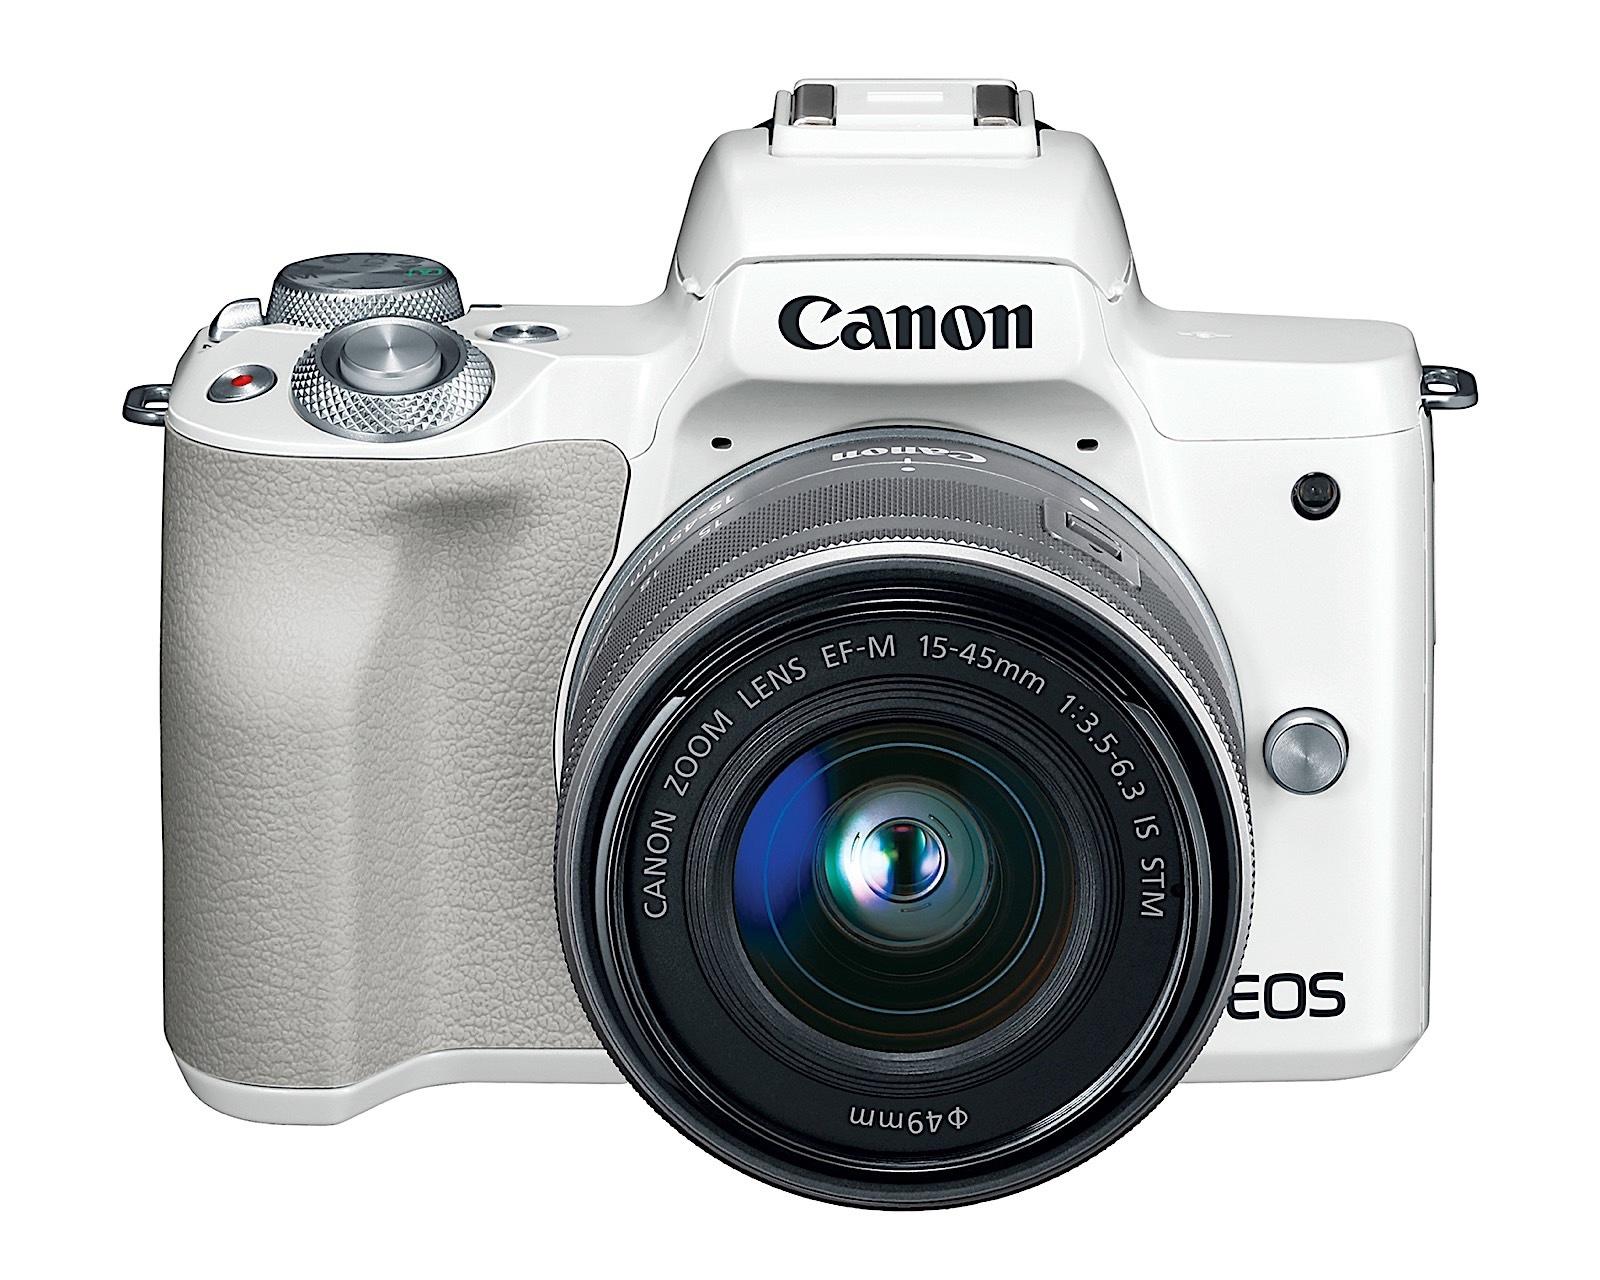 hr-eos-m50-white-efm15-45-stm-270ex-ii-cl-1.jpg